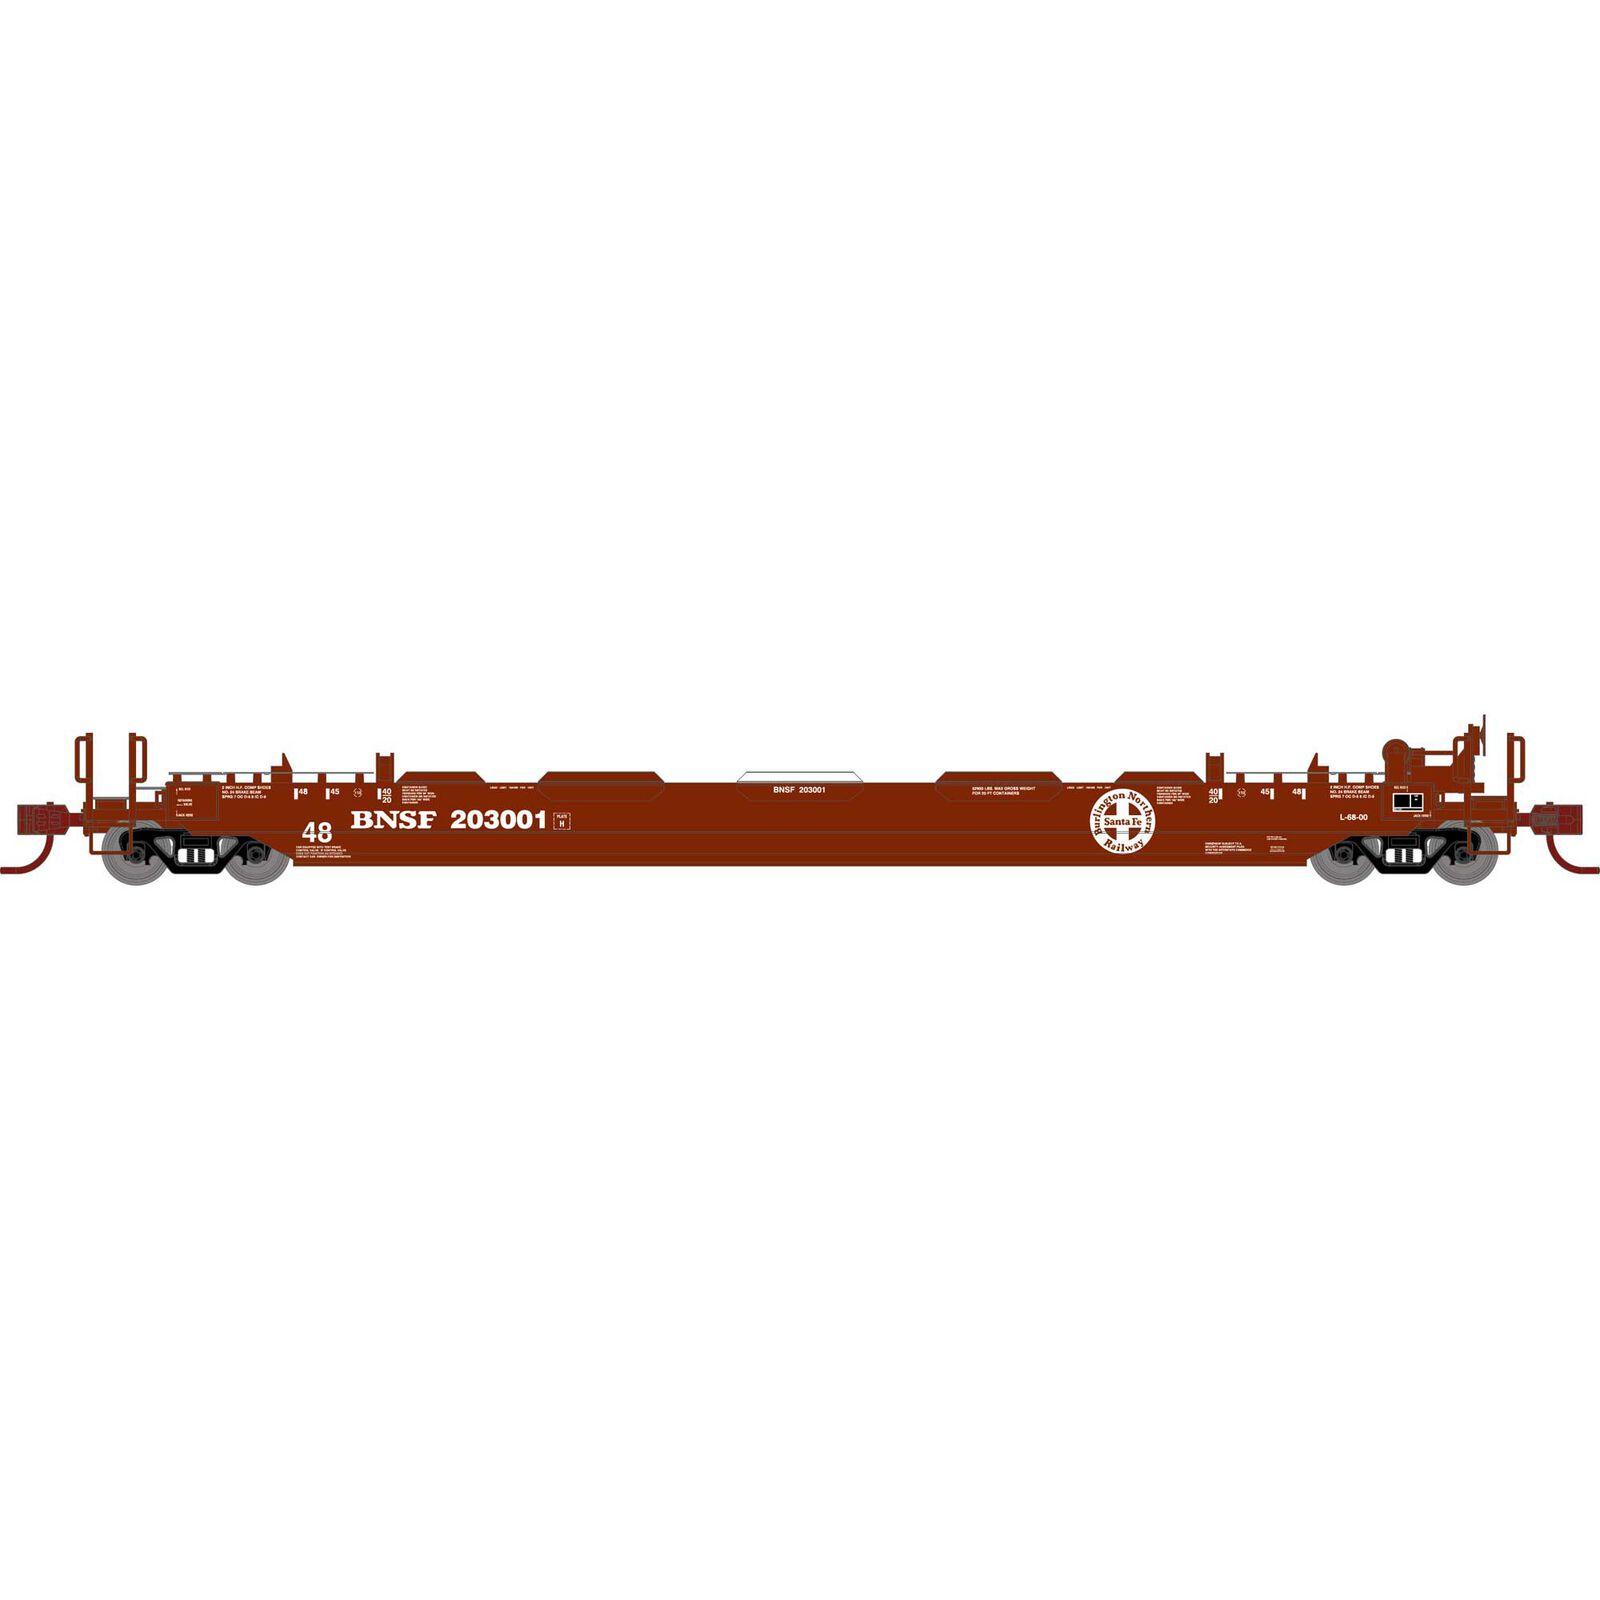 N 48' Husky Stack Well, BNSF #203001